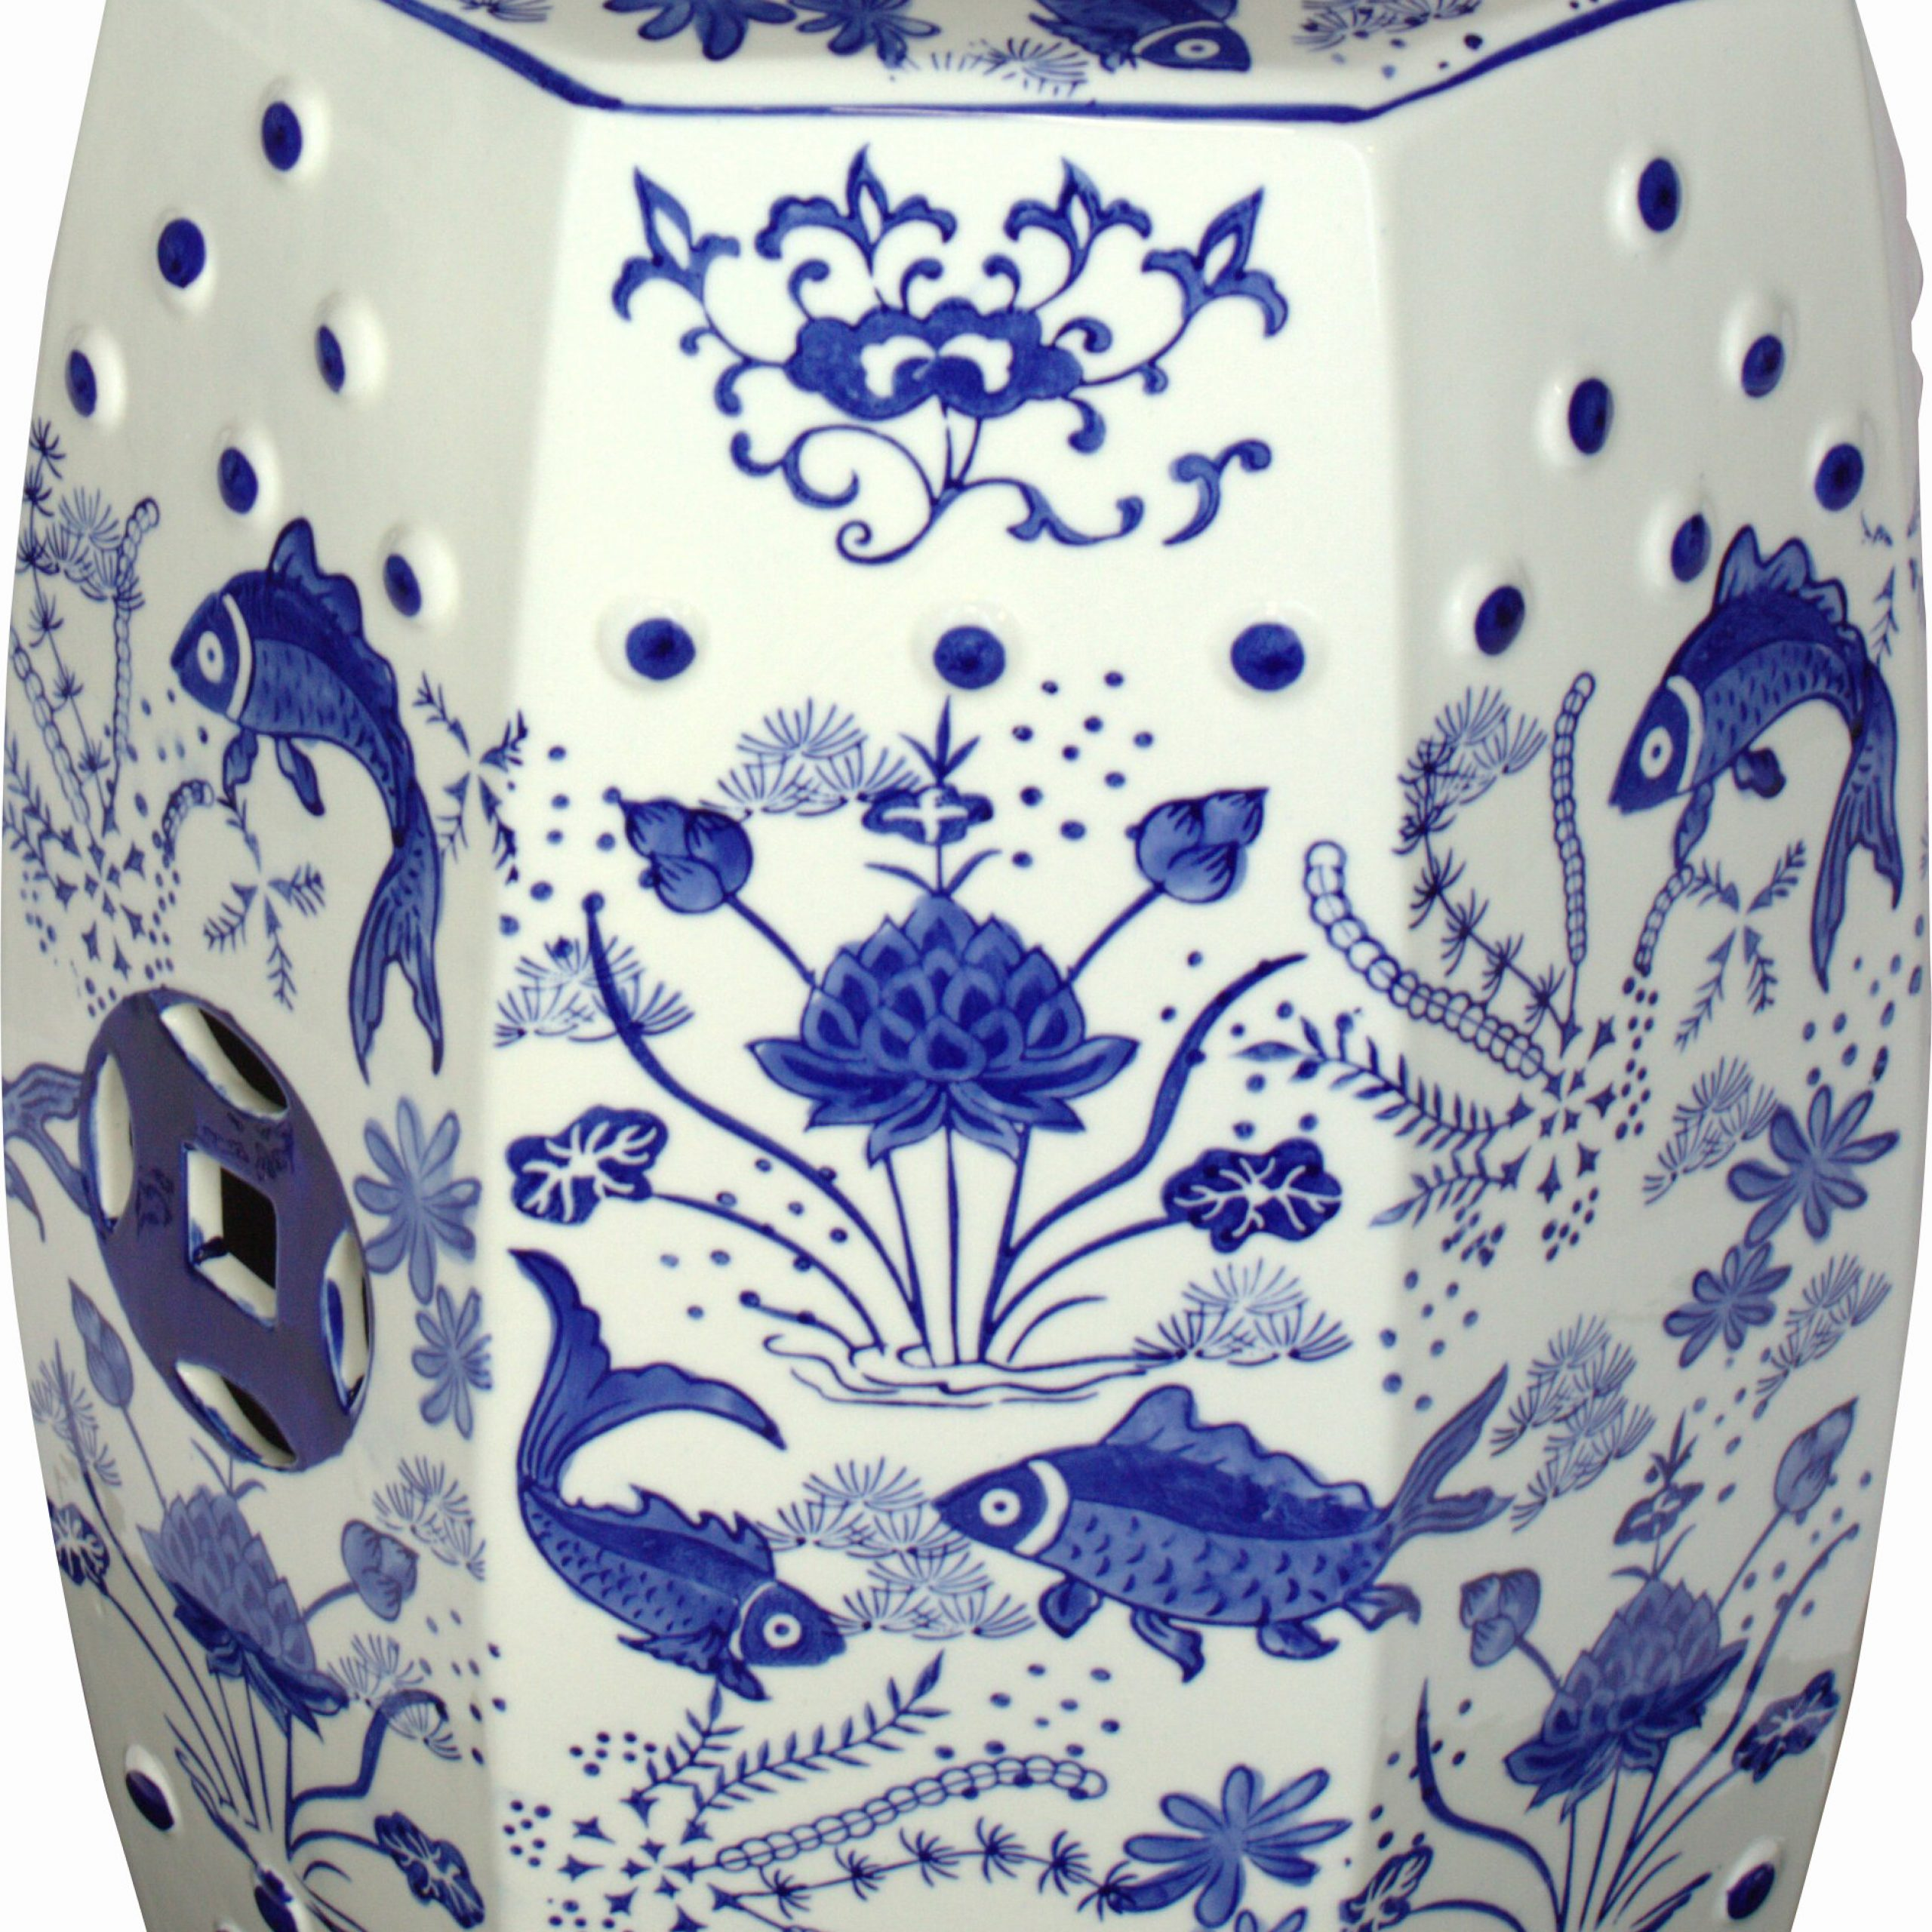 Bilmont Ceramic Garden Stool Inside Winterview Garden Stools (View 24 of 25)